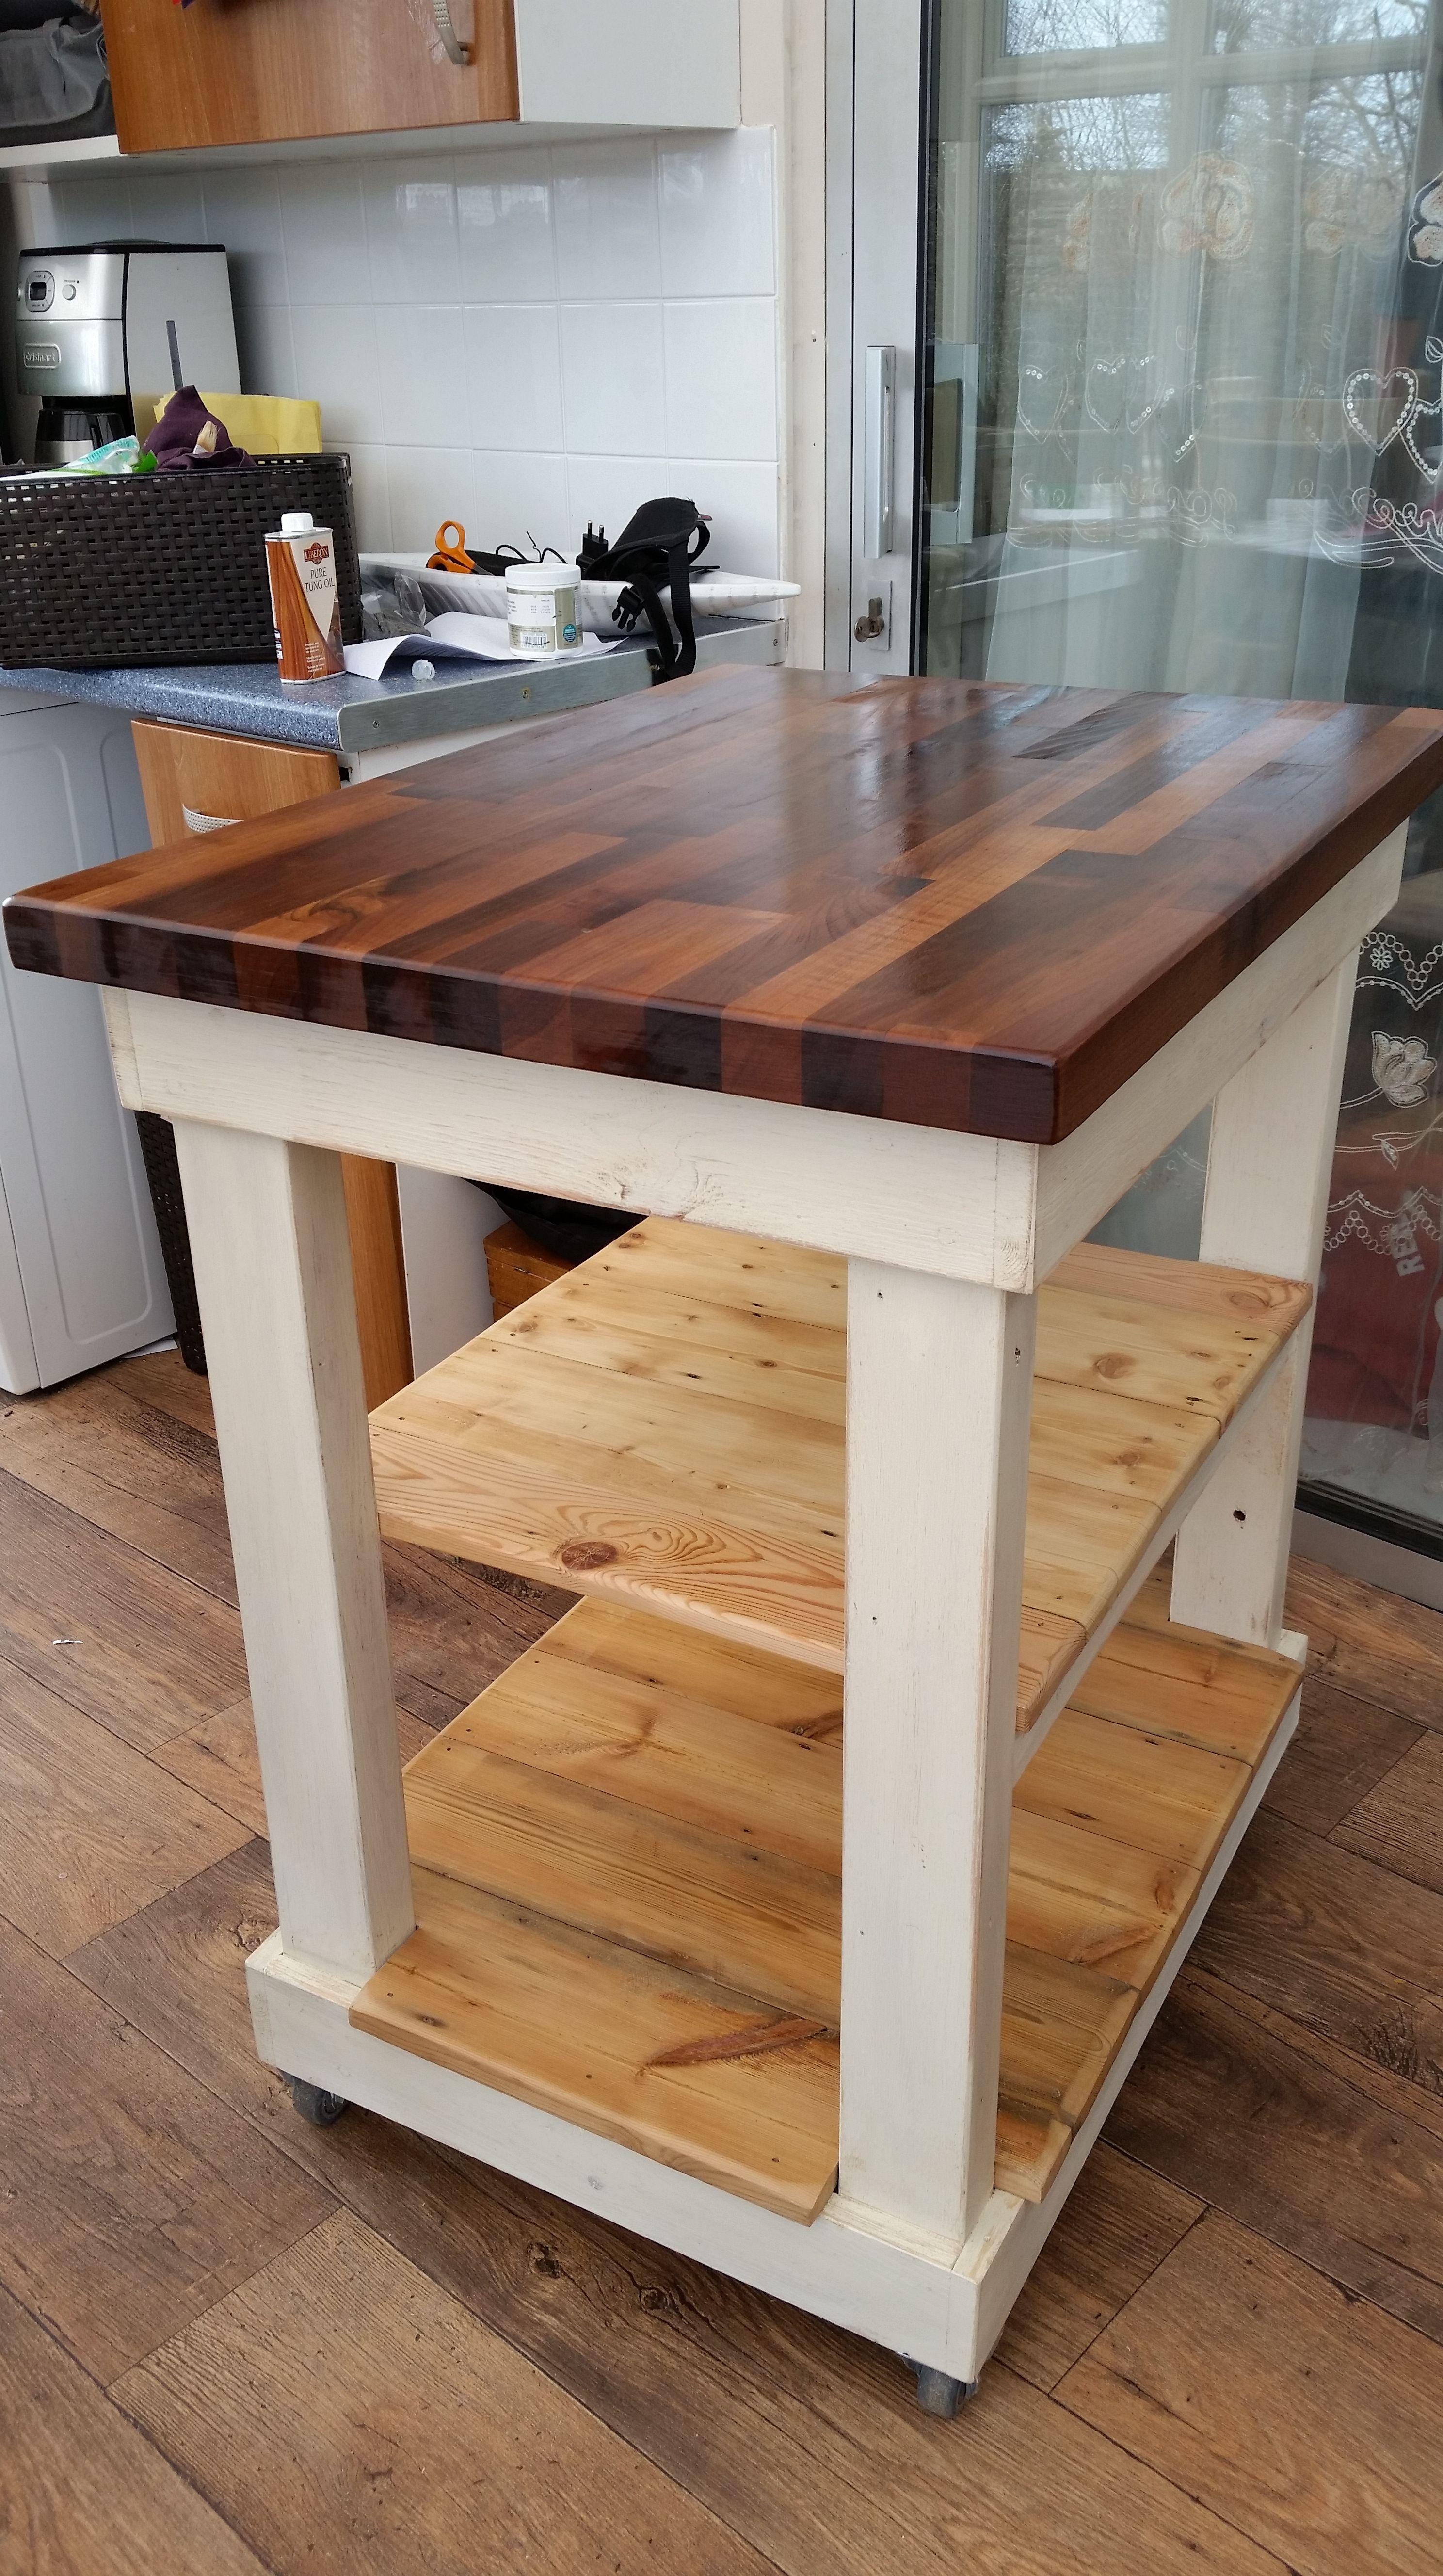 Pin by Marcus Postin on woodandwallart.com in 2019 Diy furniture, Diy kitchen island ...